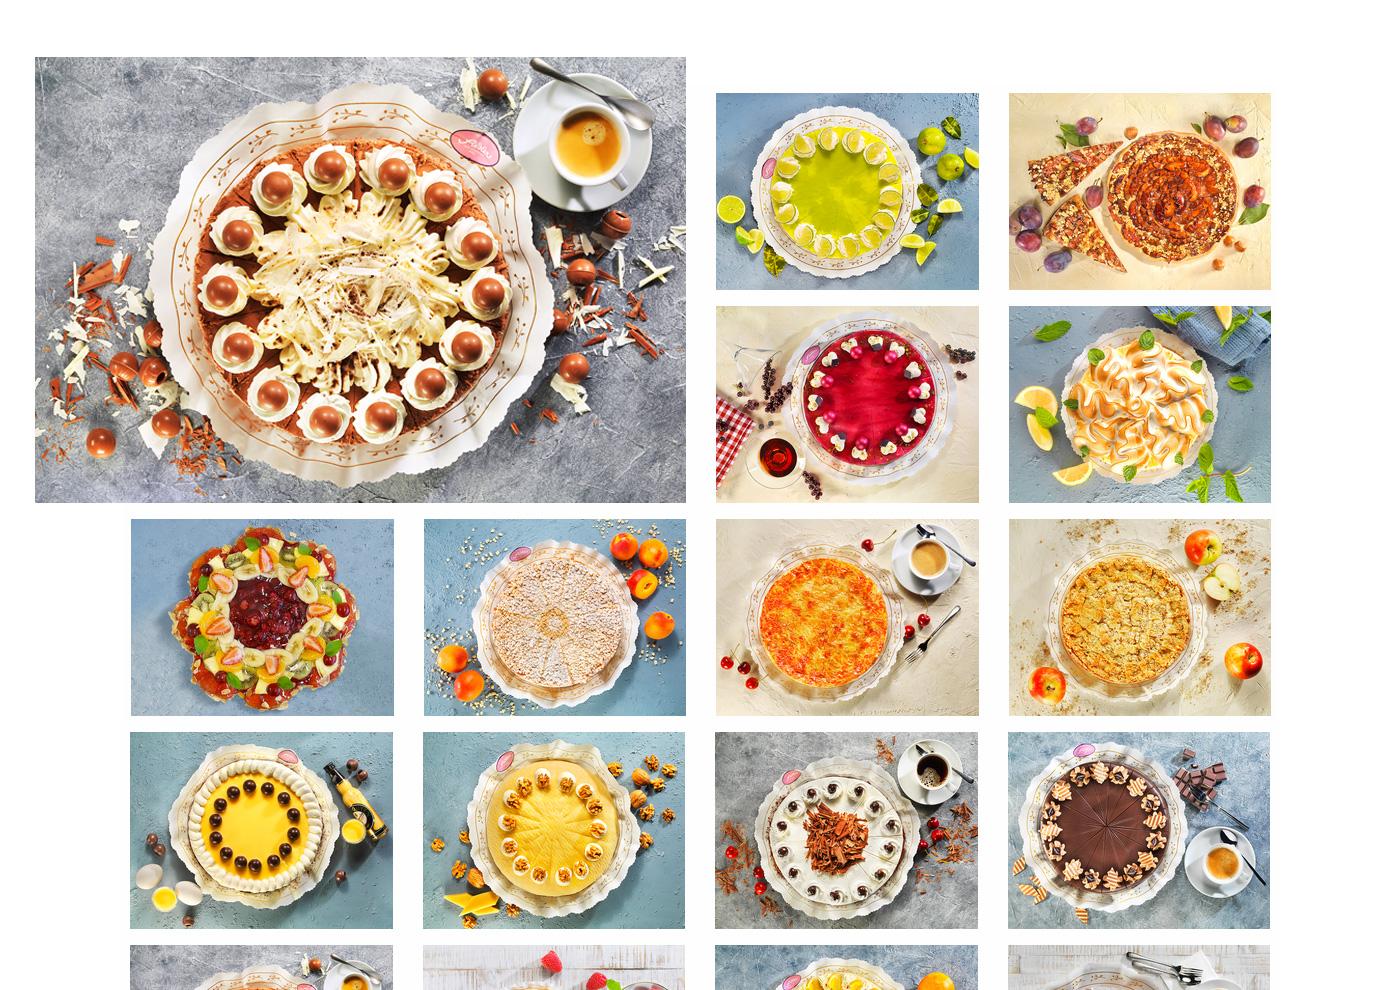 CD-Relaunch, Web und Social Media für Café Fiedler - Fotografie